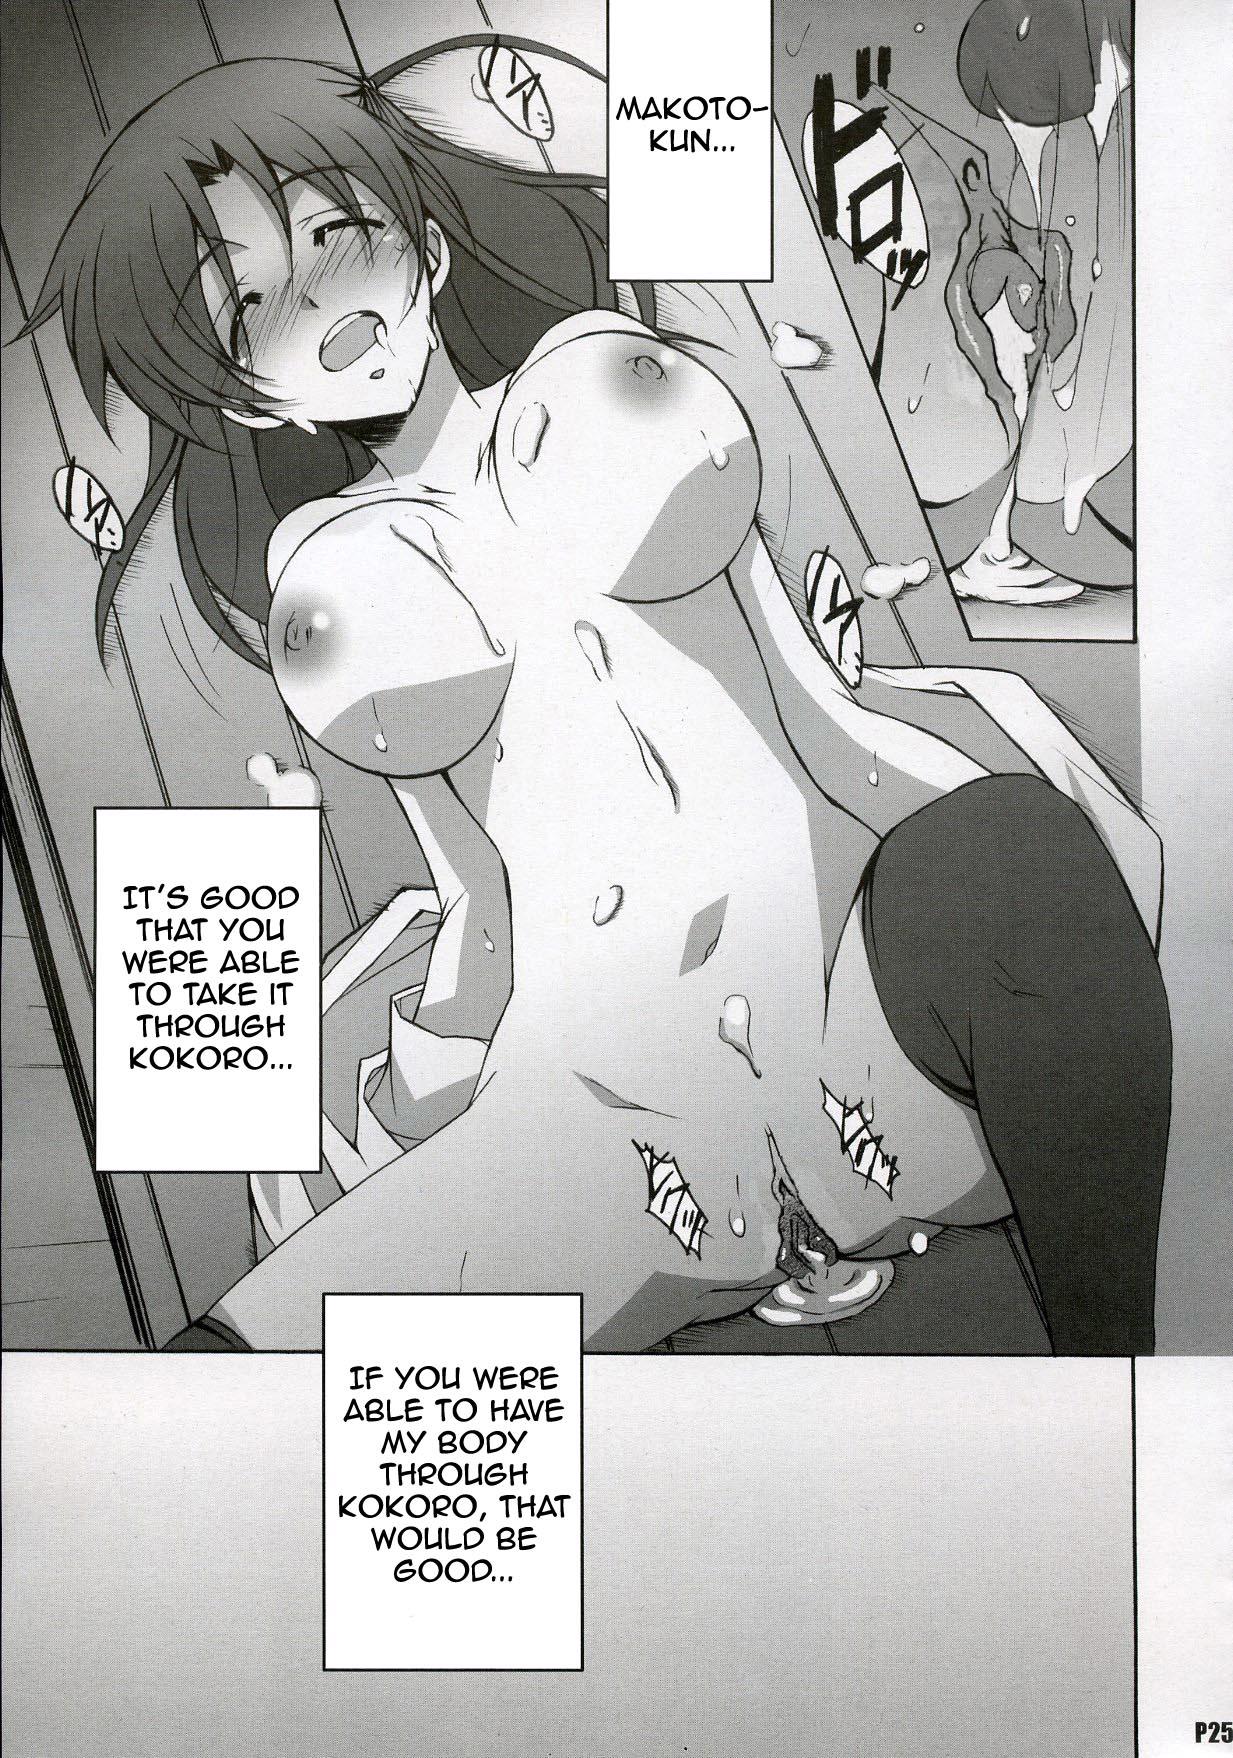 school days hentai kokoro porn schooldays hentai porn schooldays hentai porn school days hentai porn